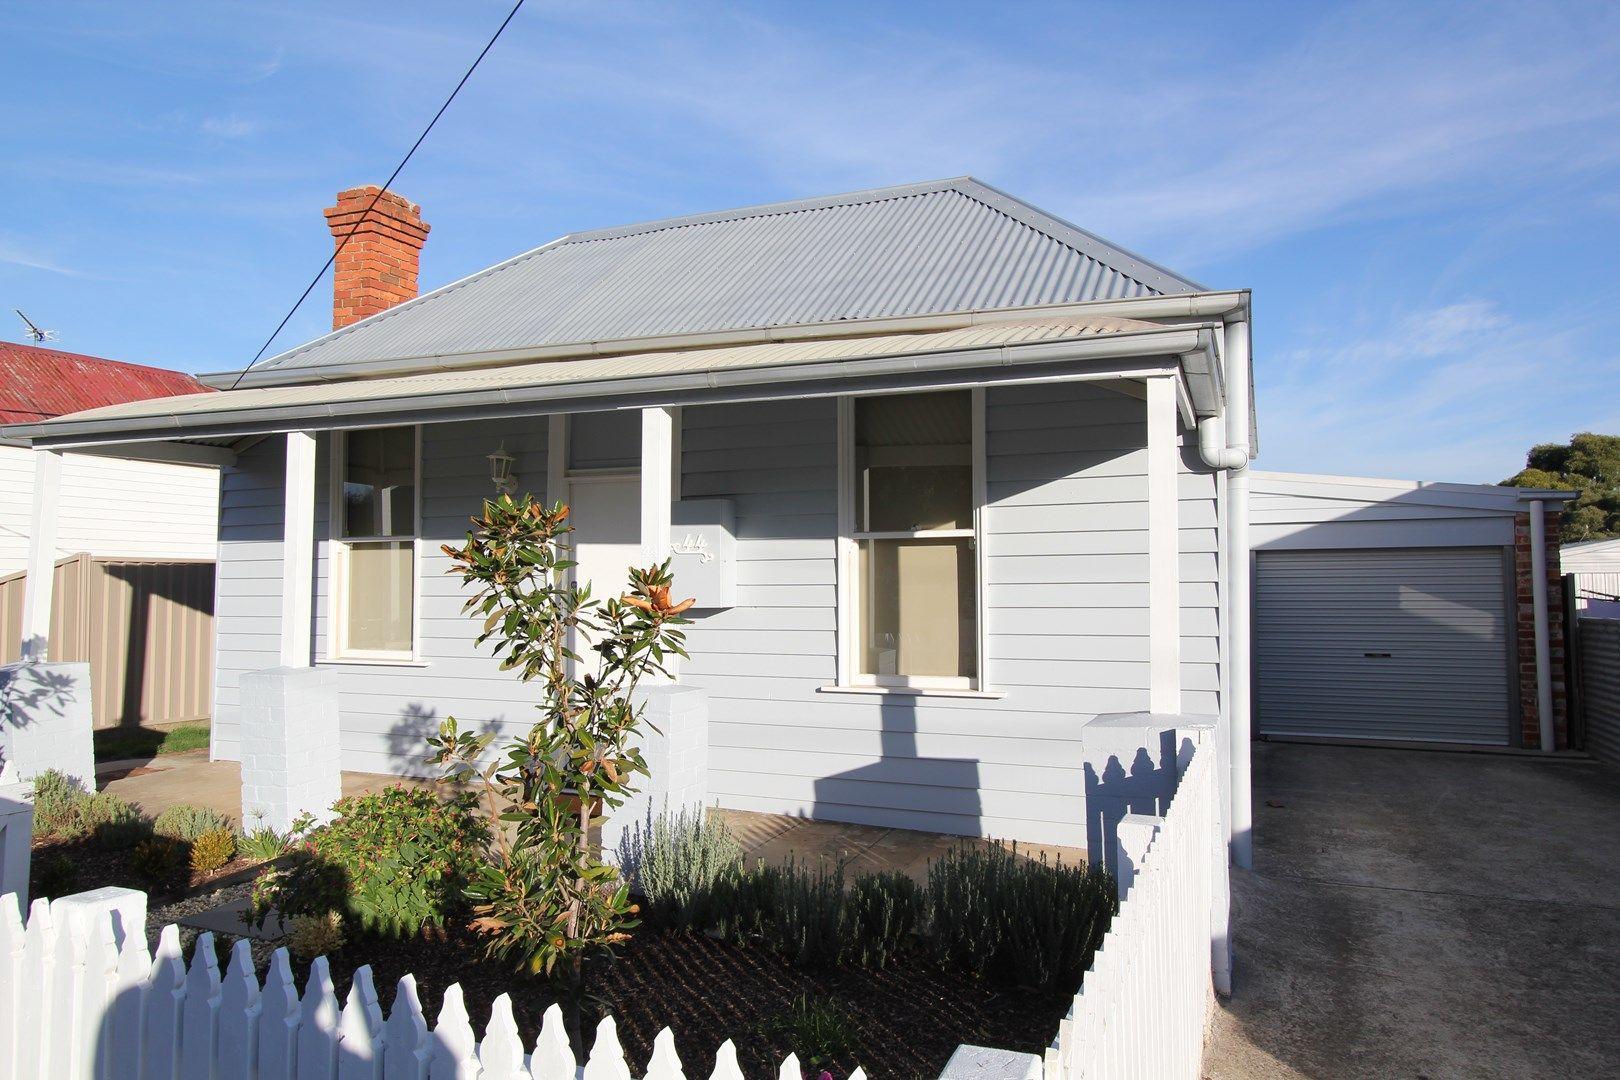 44 Hopetoun Street, Ballarat East VIC 3350, Image 0